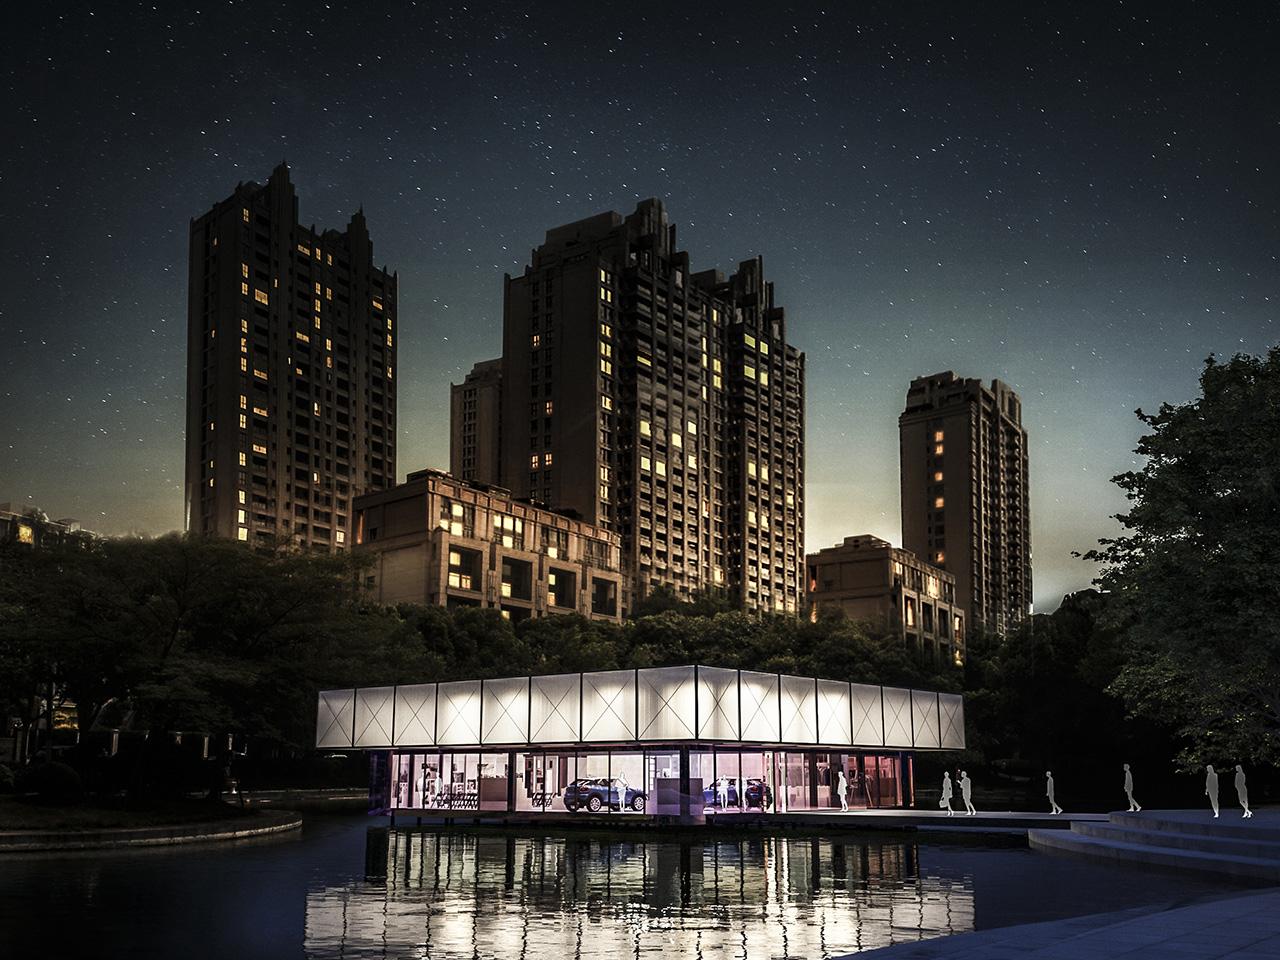 @ AVANTGARDE // Shanghai Nights